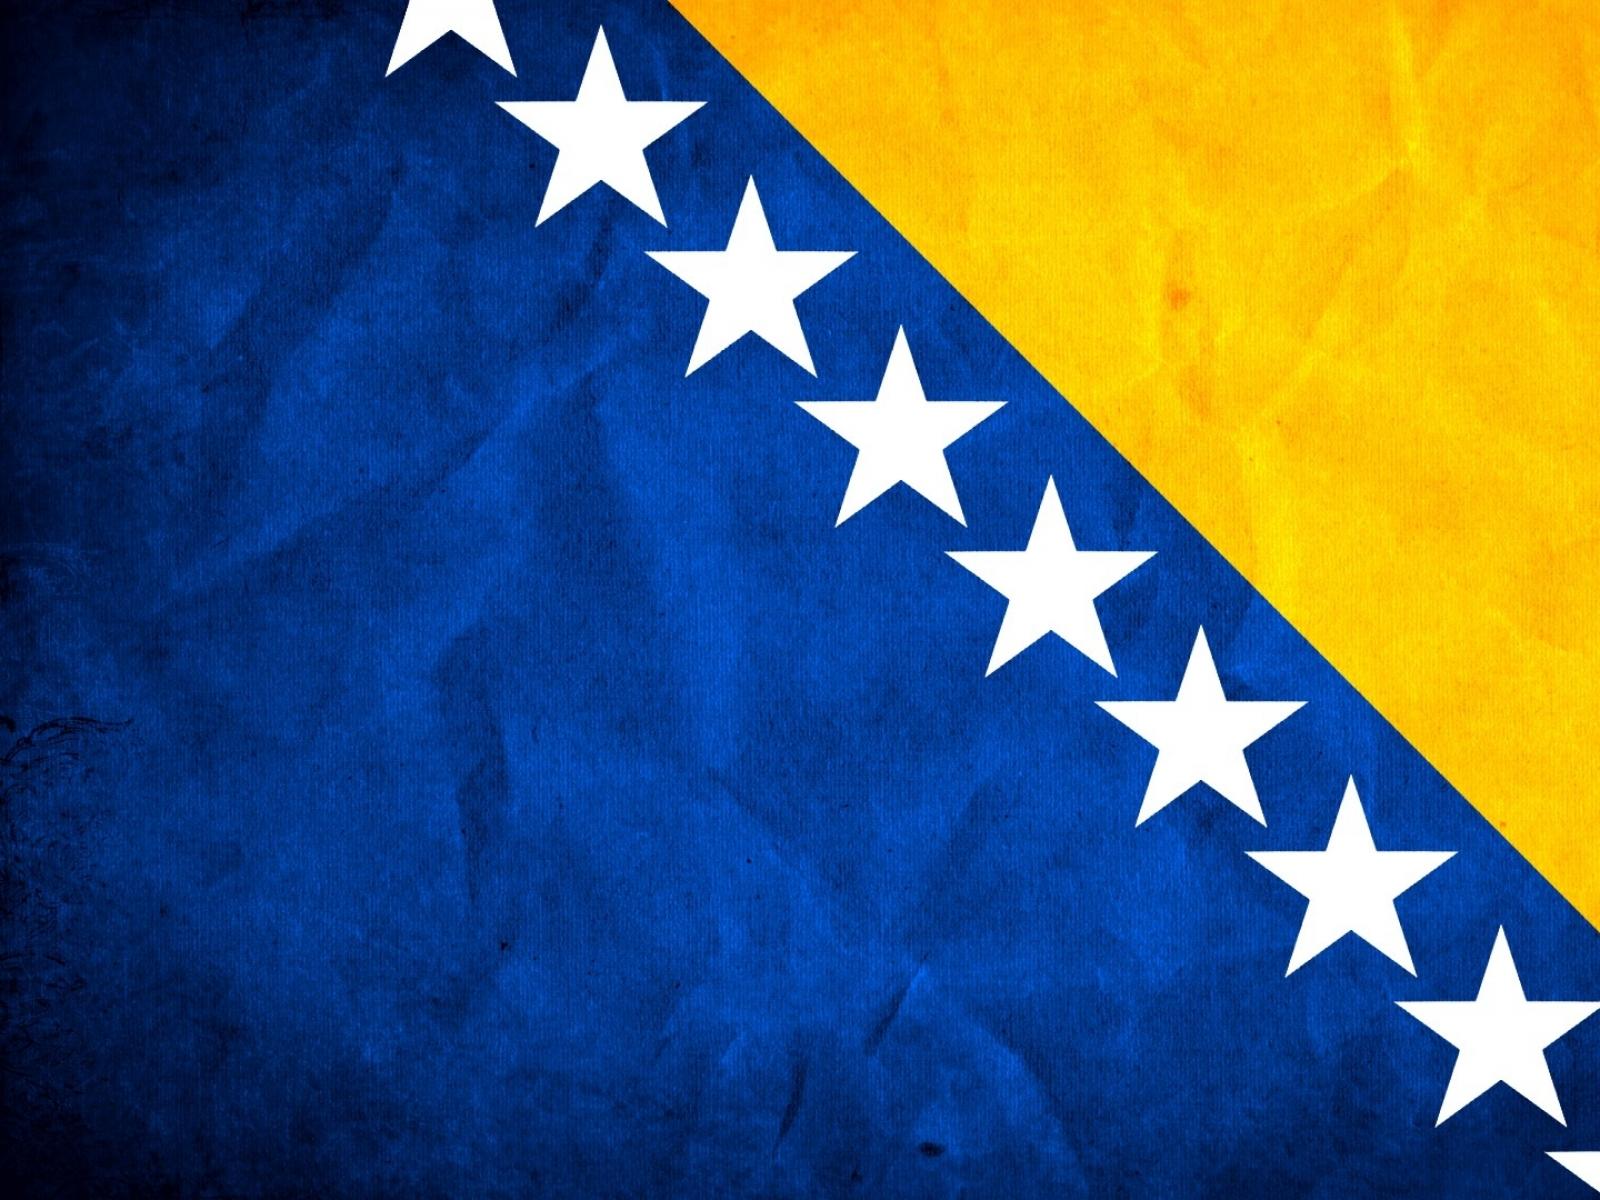 Dan državnosti BiH